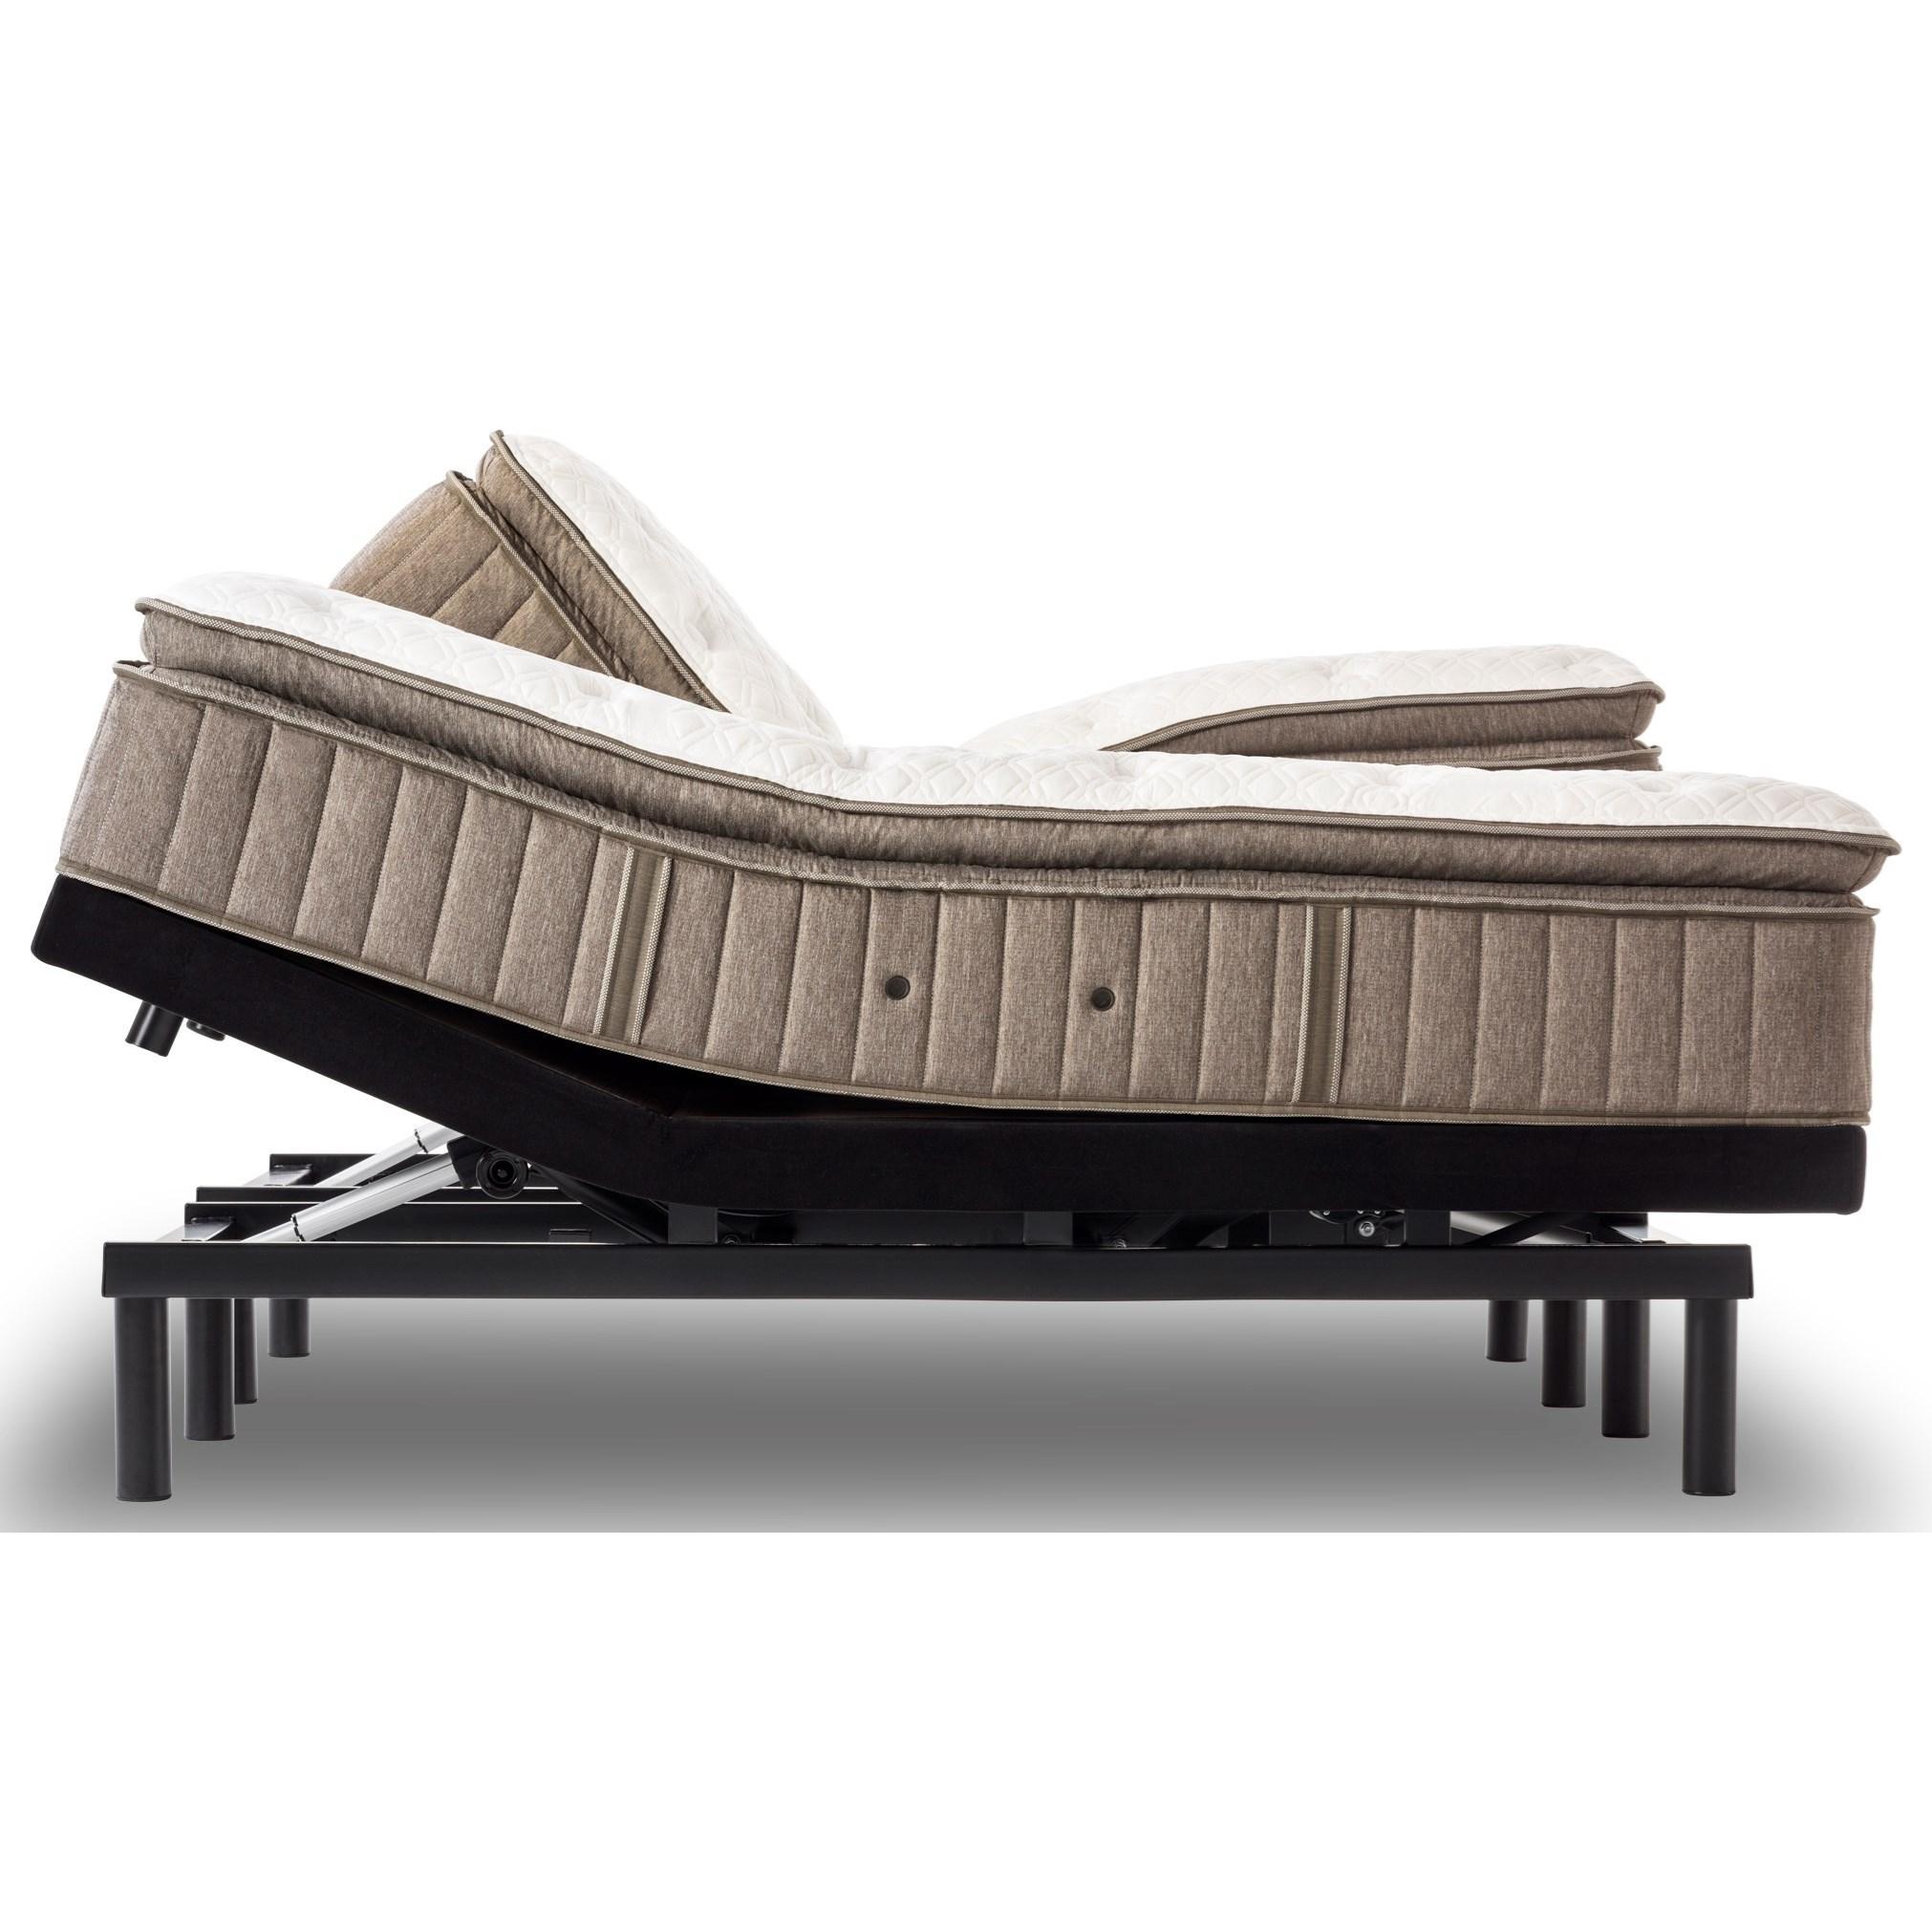 Stearns & Foster F2 Estate CF EPT 2016 Cal King Cushion Firm Euro PT Adjustable Set - Item Number: CushFirmEPT-CK+2xEase-SPCK